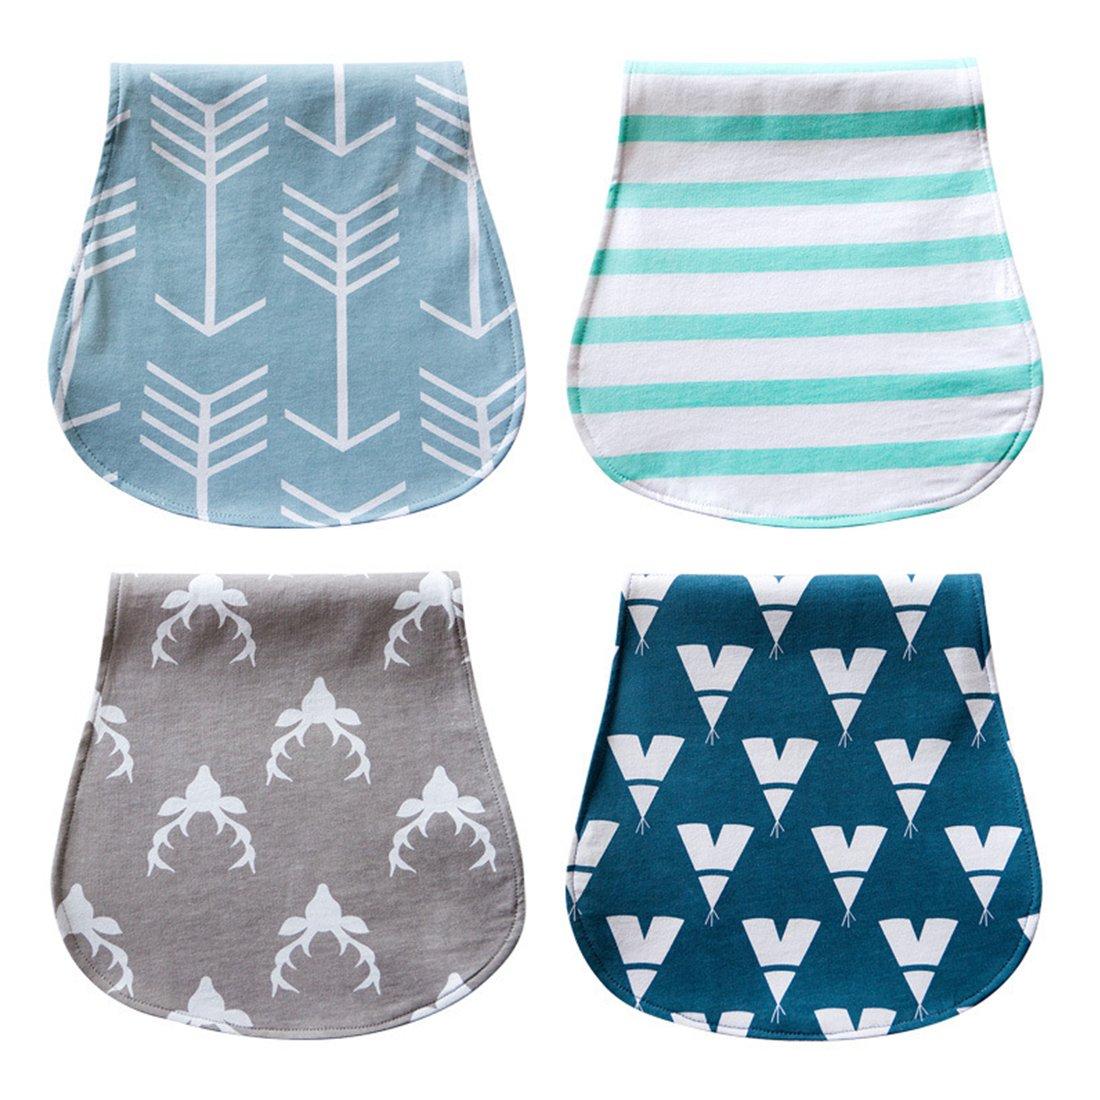 modesoda Baby Bibs Organic Cotton Arrows Burp Clothes for Toddler Girls Boys 4-Pack … 60035300